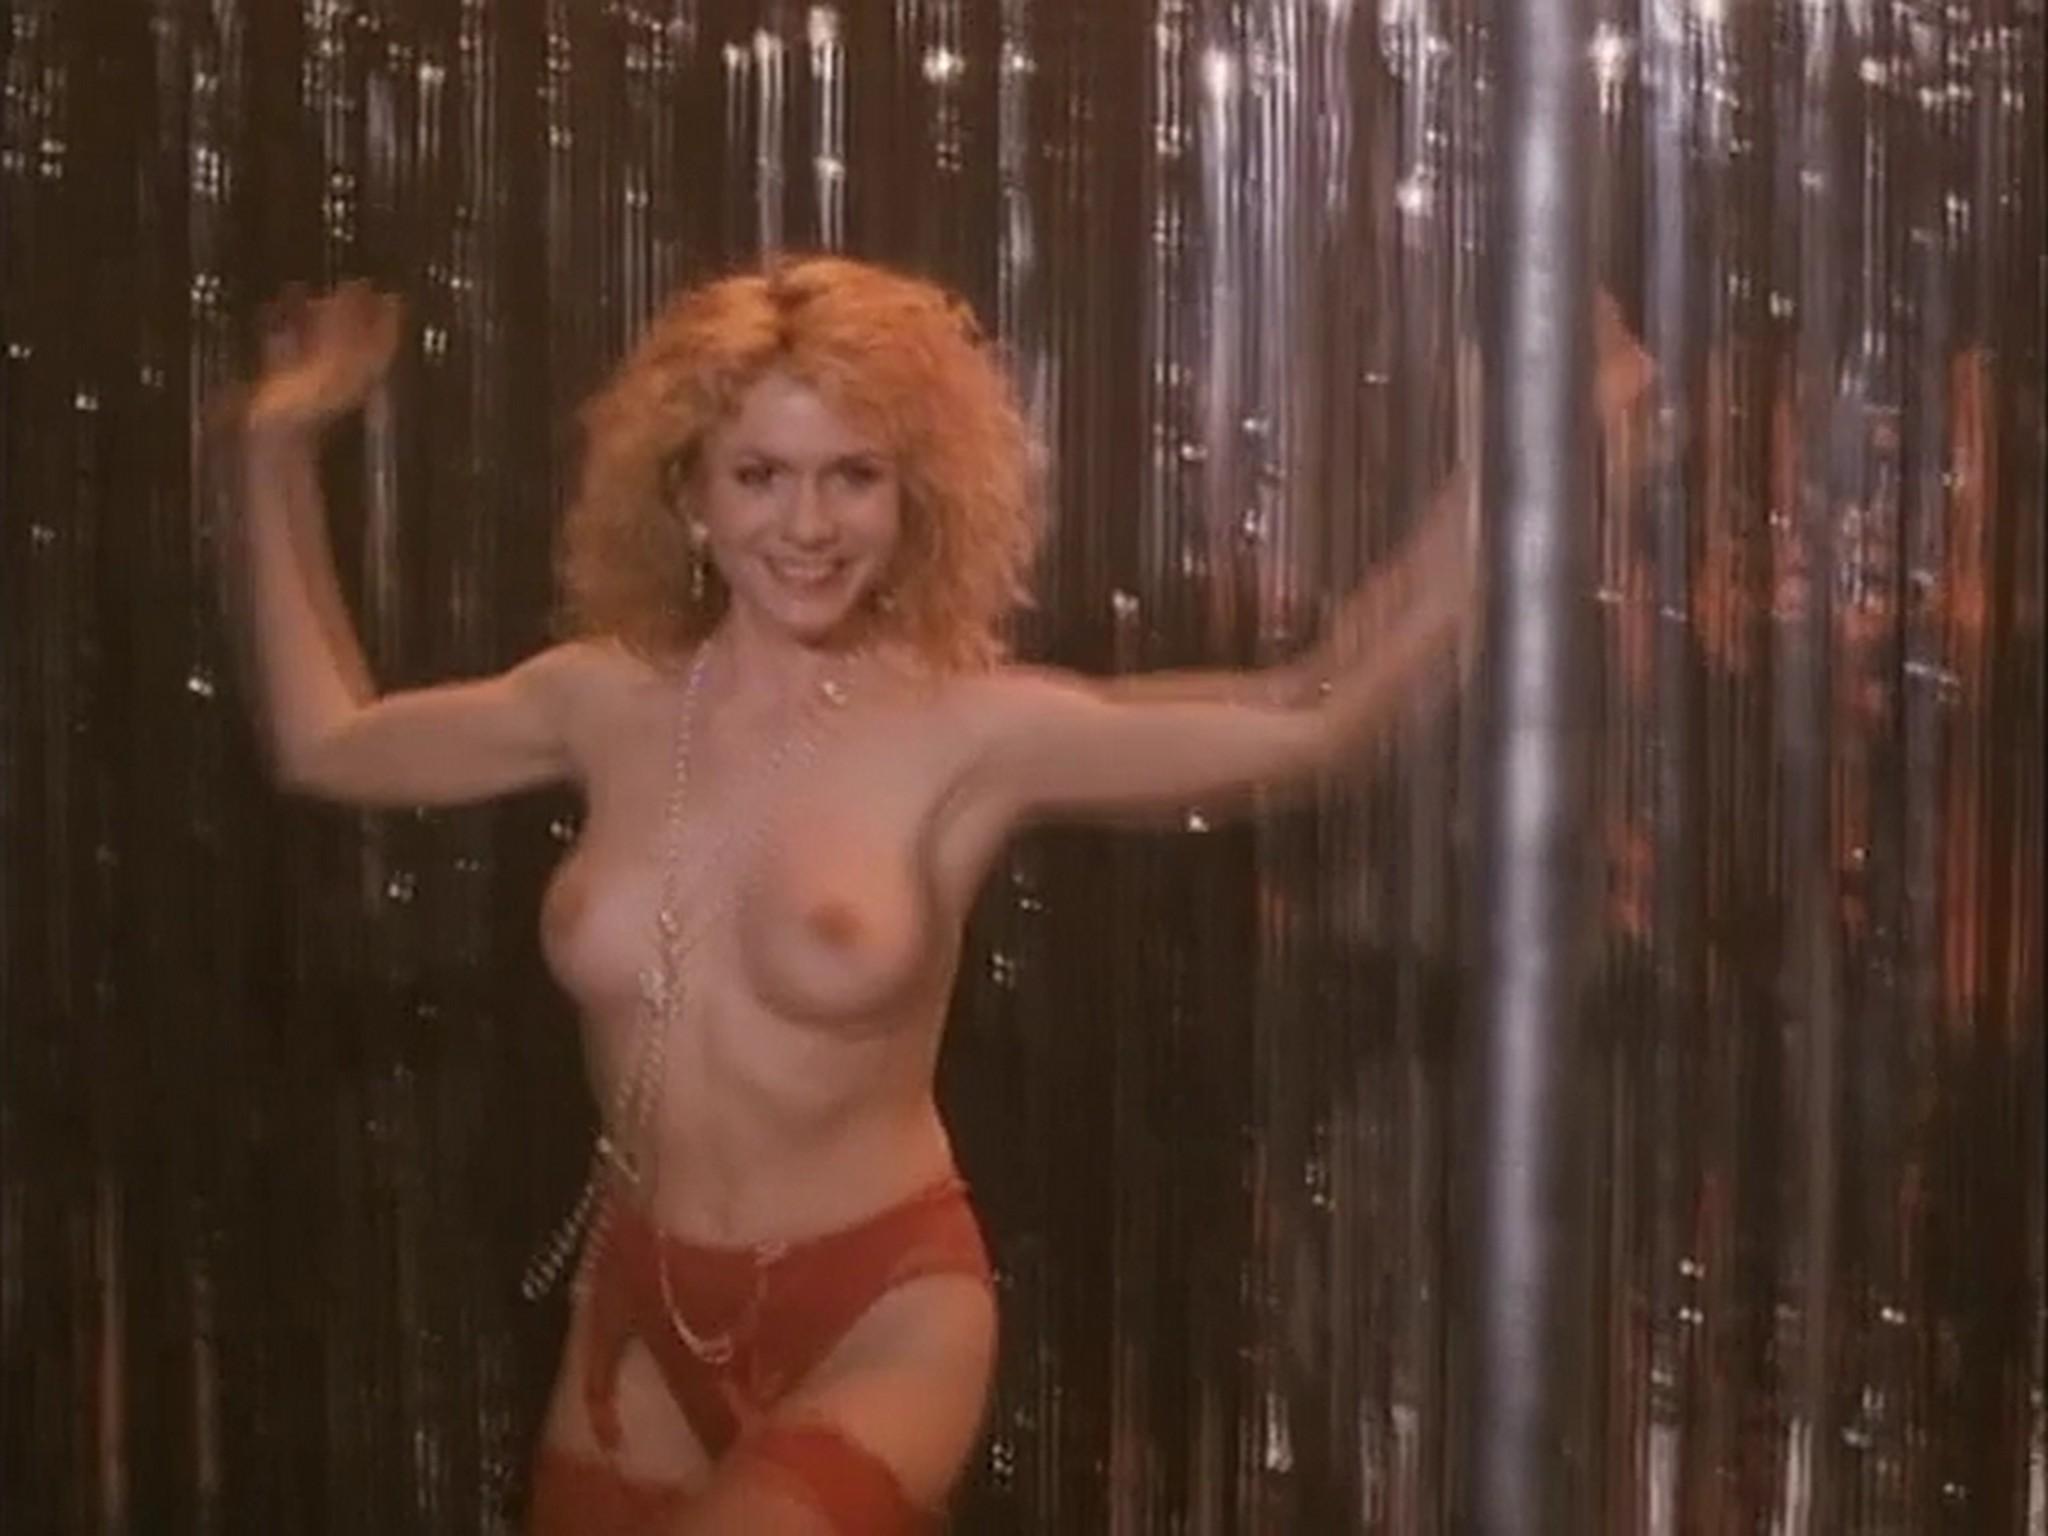 Barbara Alyn Woods nude Catya Sassoon Jill Pierce nude too as strippers Dance with Death 1991 11